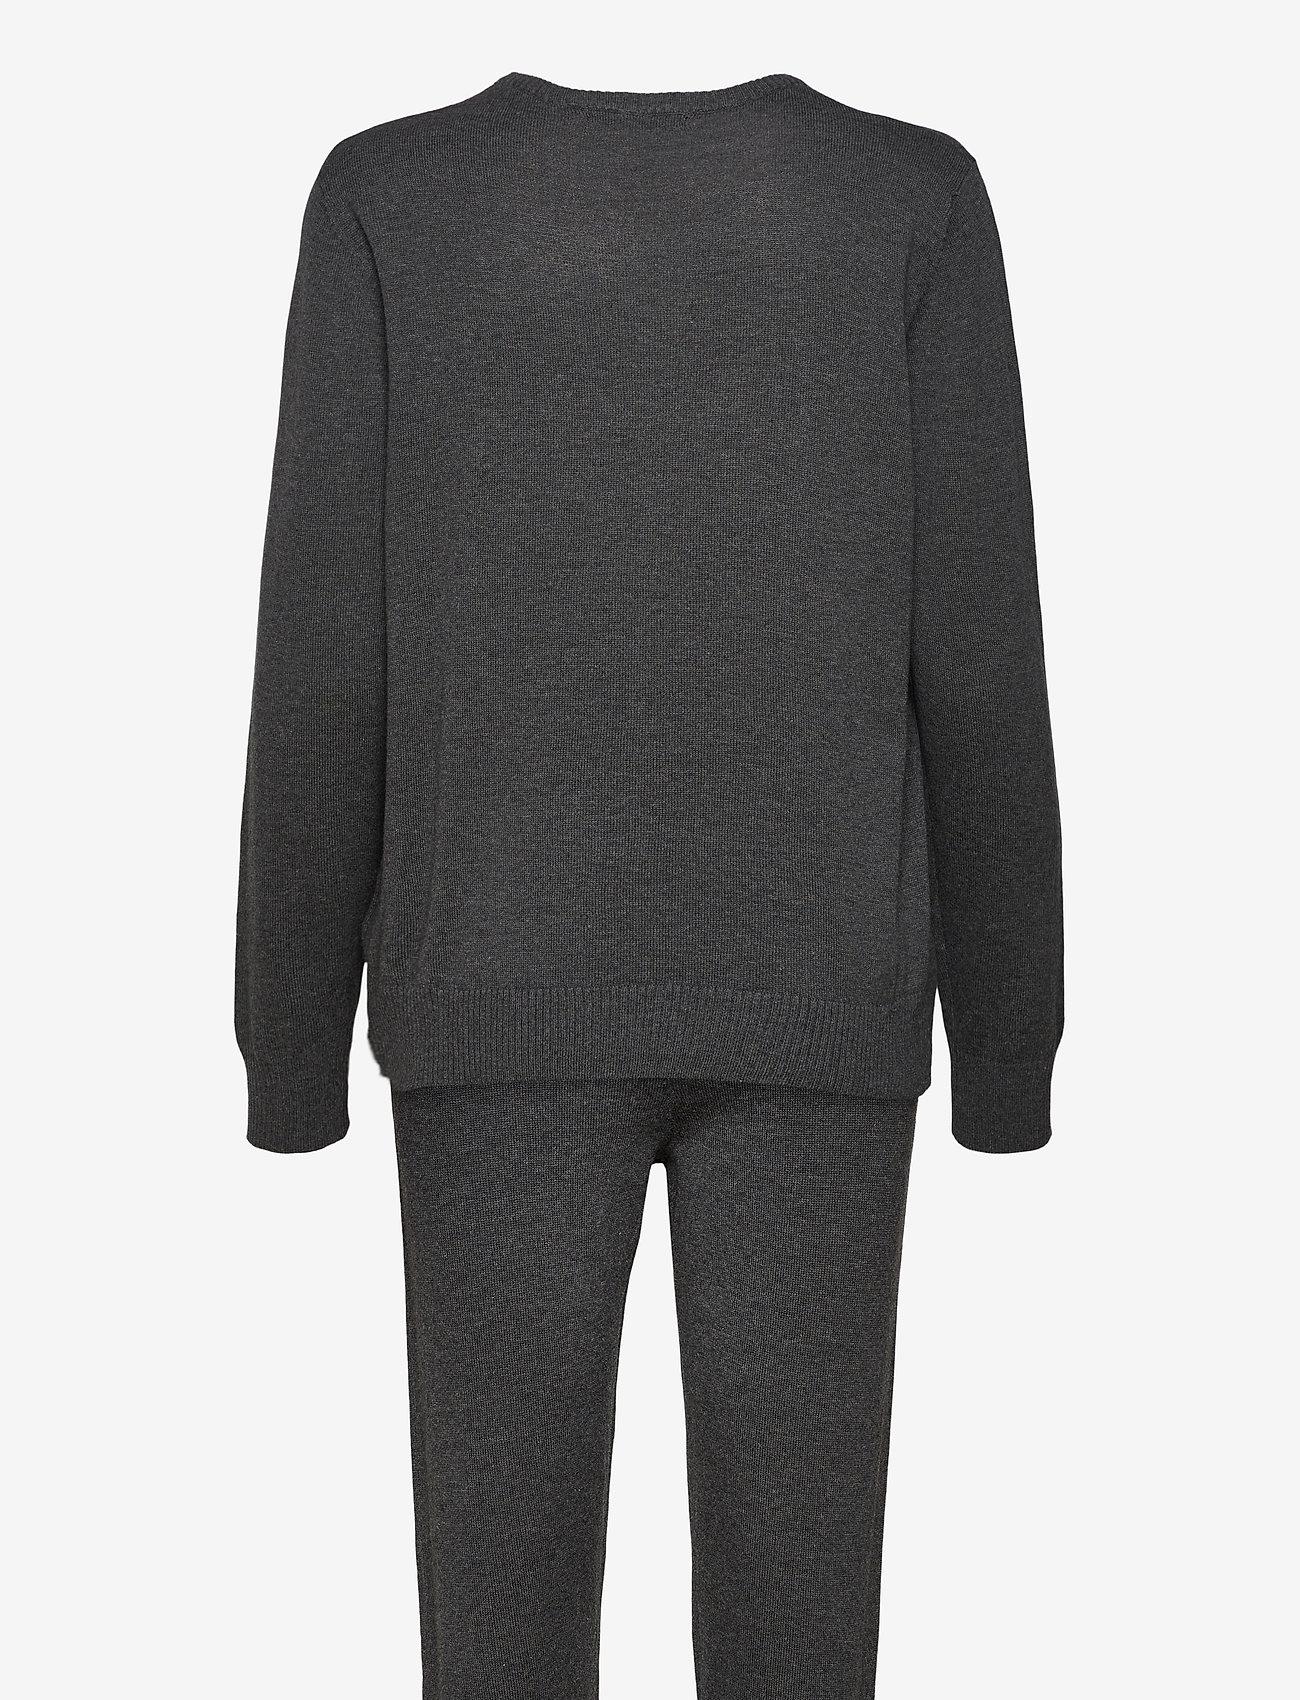 Decoy - DECOY knit set loungewear - pyjama''s - mörkgrå me - 1